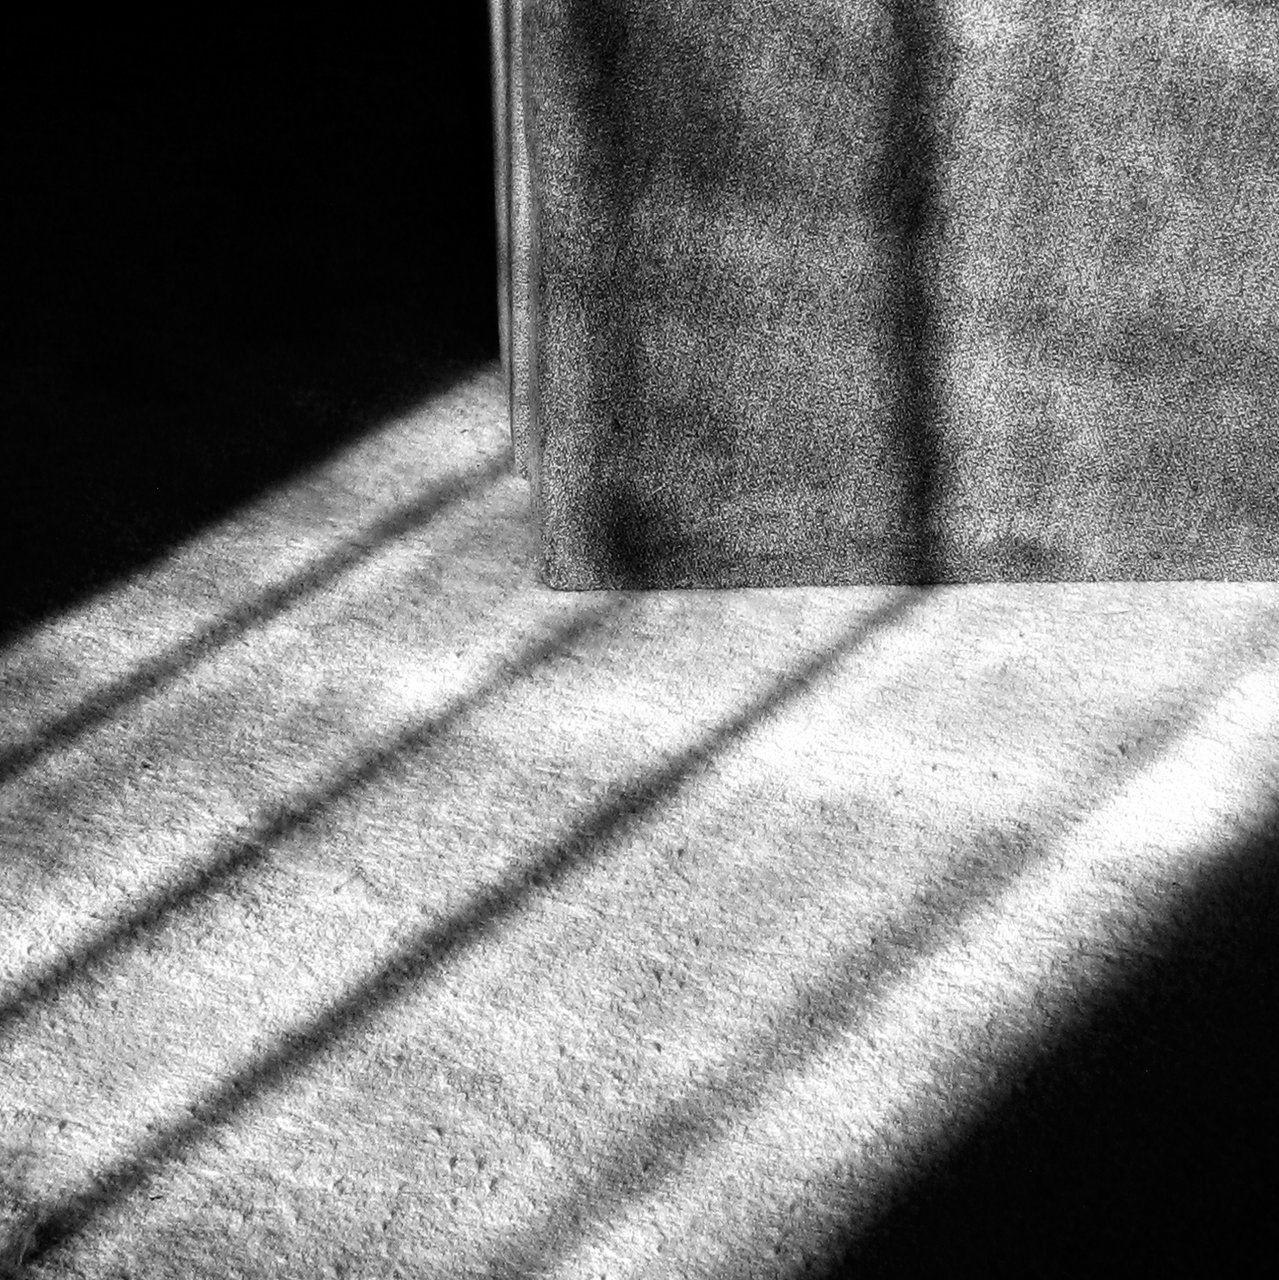 Photo in Abstract | Author Андро  - PhotoJunior | PHOTO FORUM